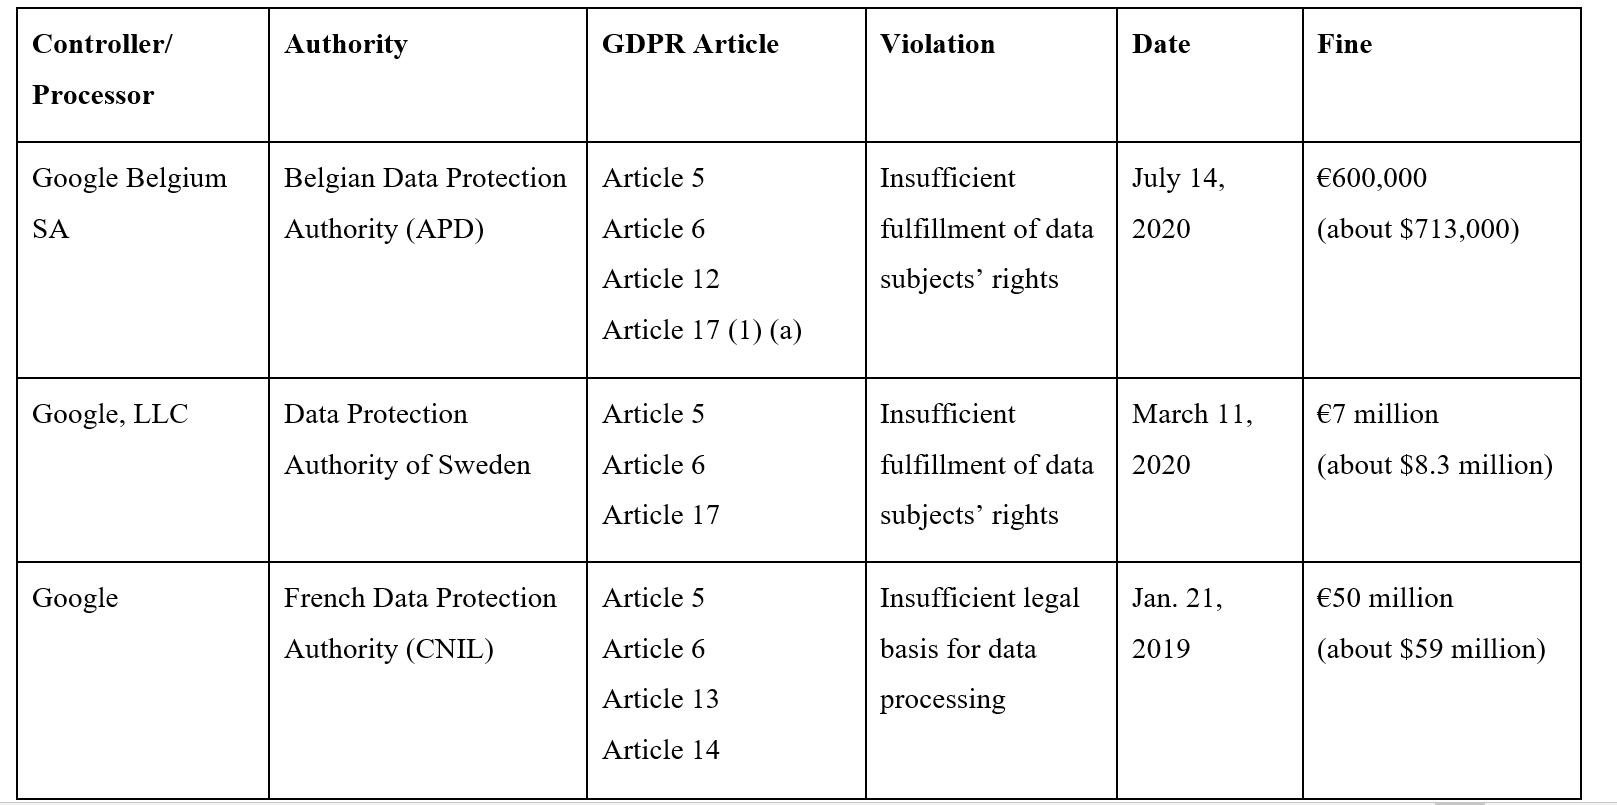 GDPR Table - Google